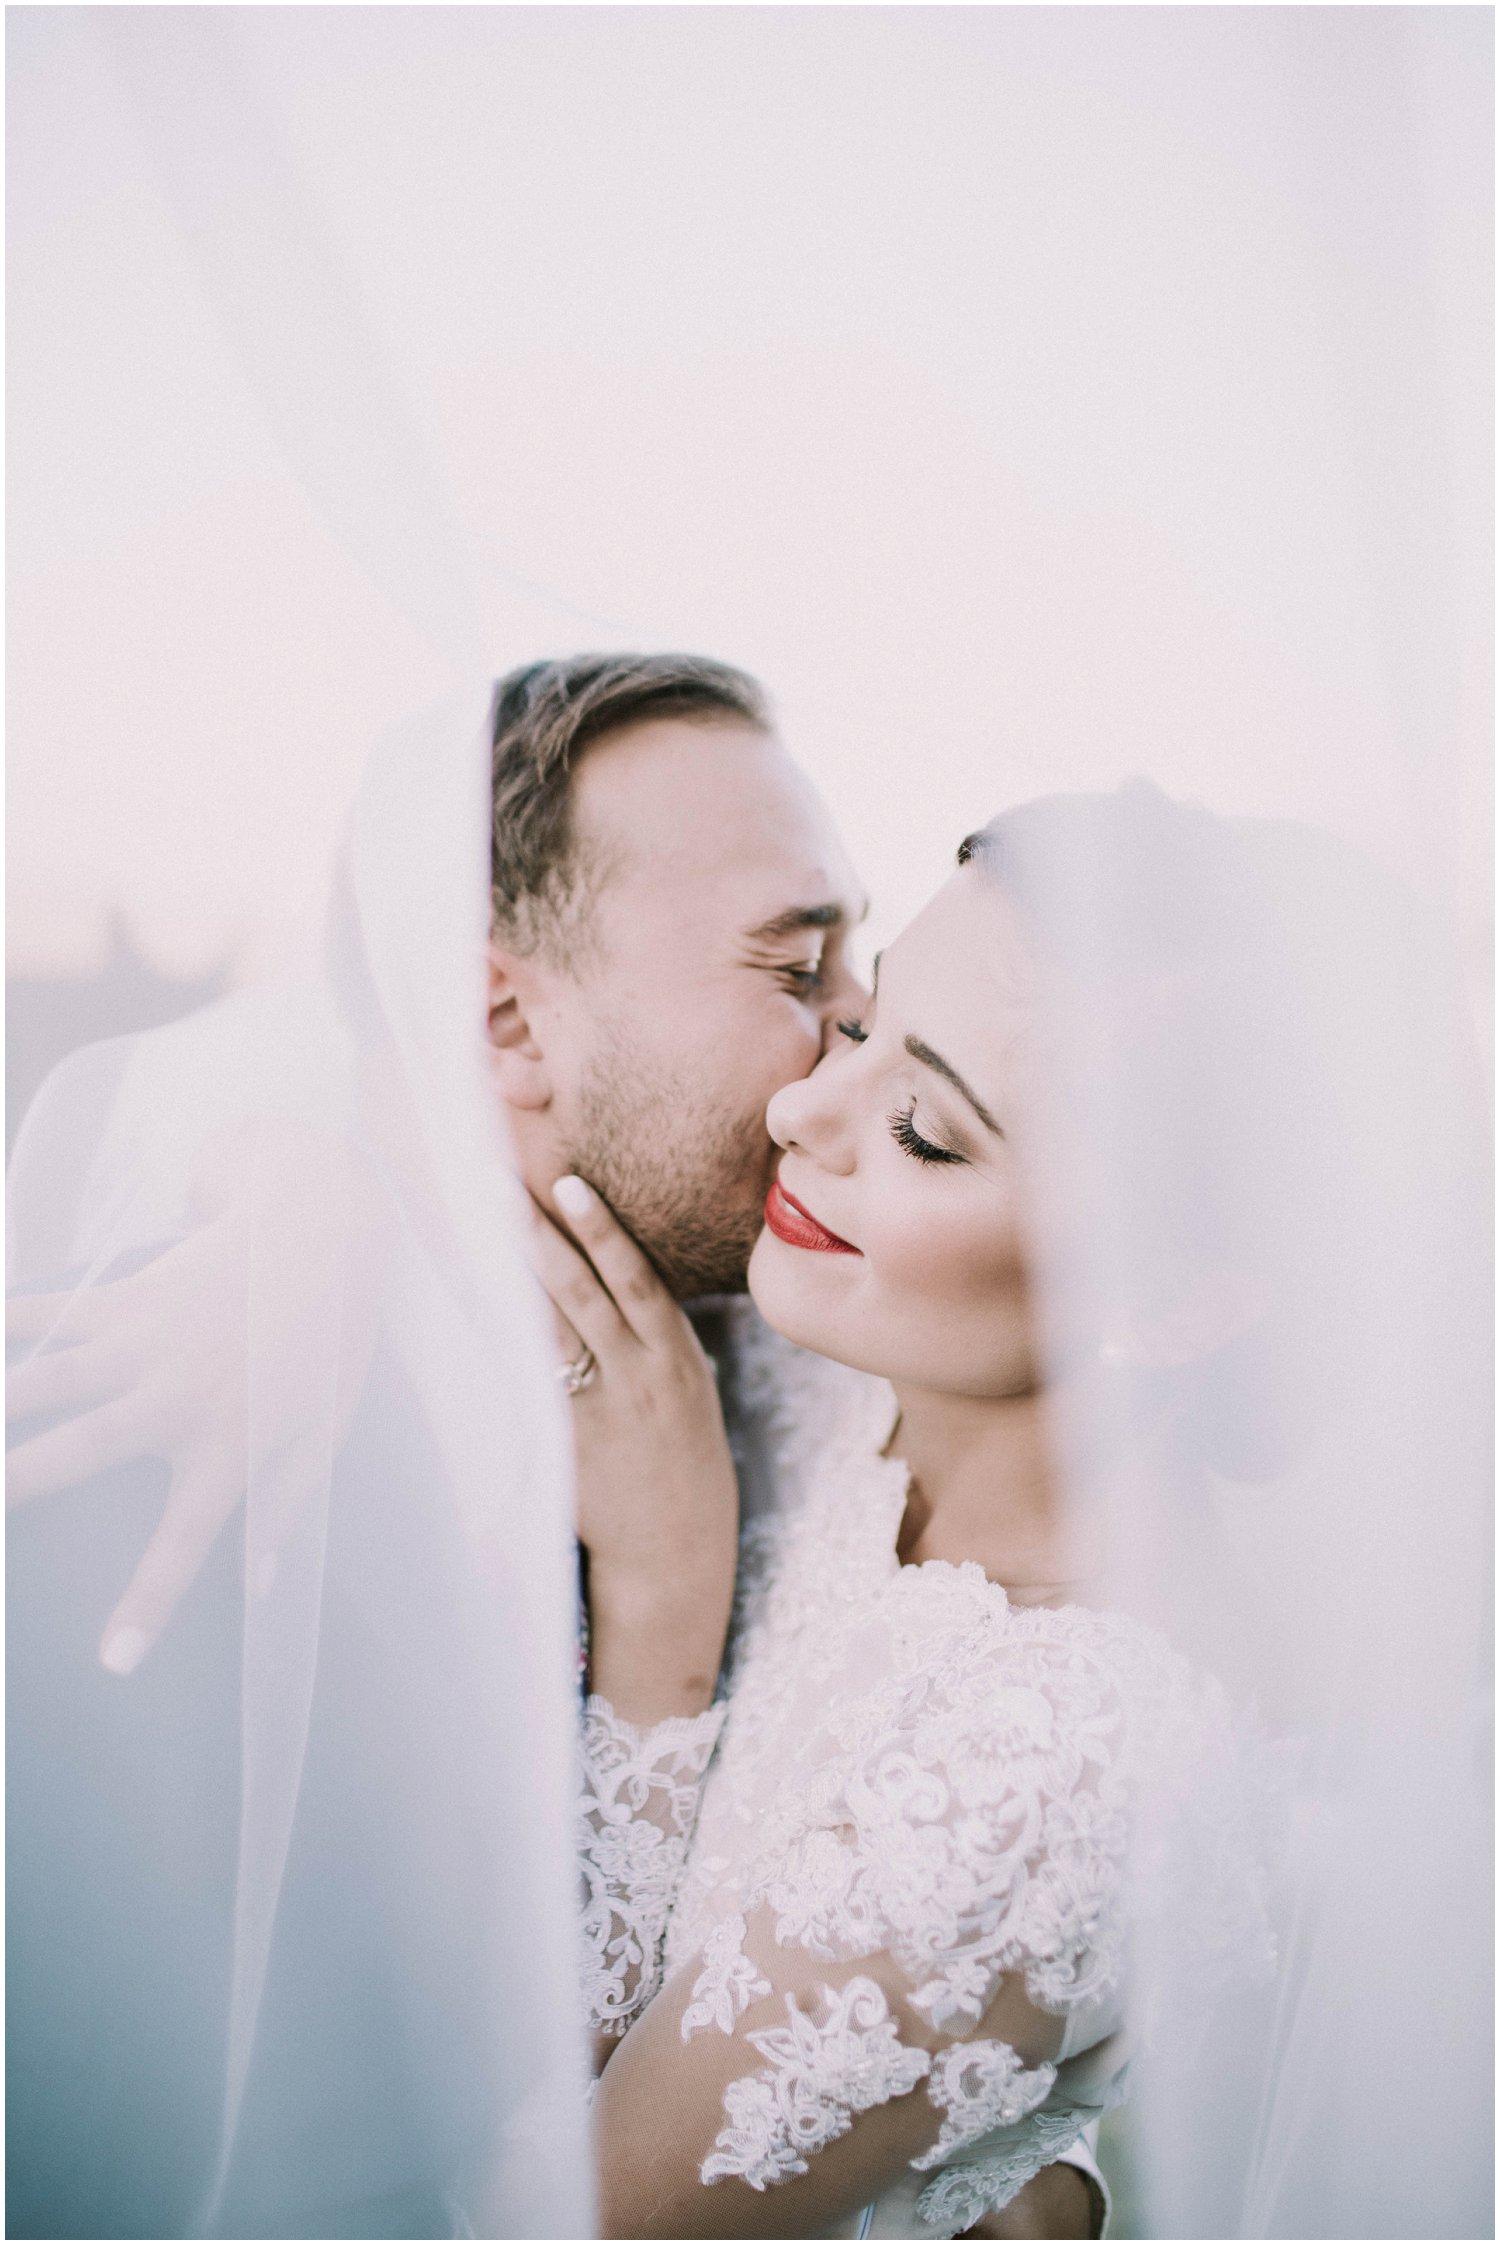 cape town wedding photographer rue kruger roneal stephan groenrivier (39).jpg